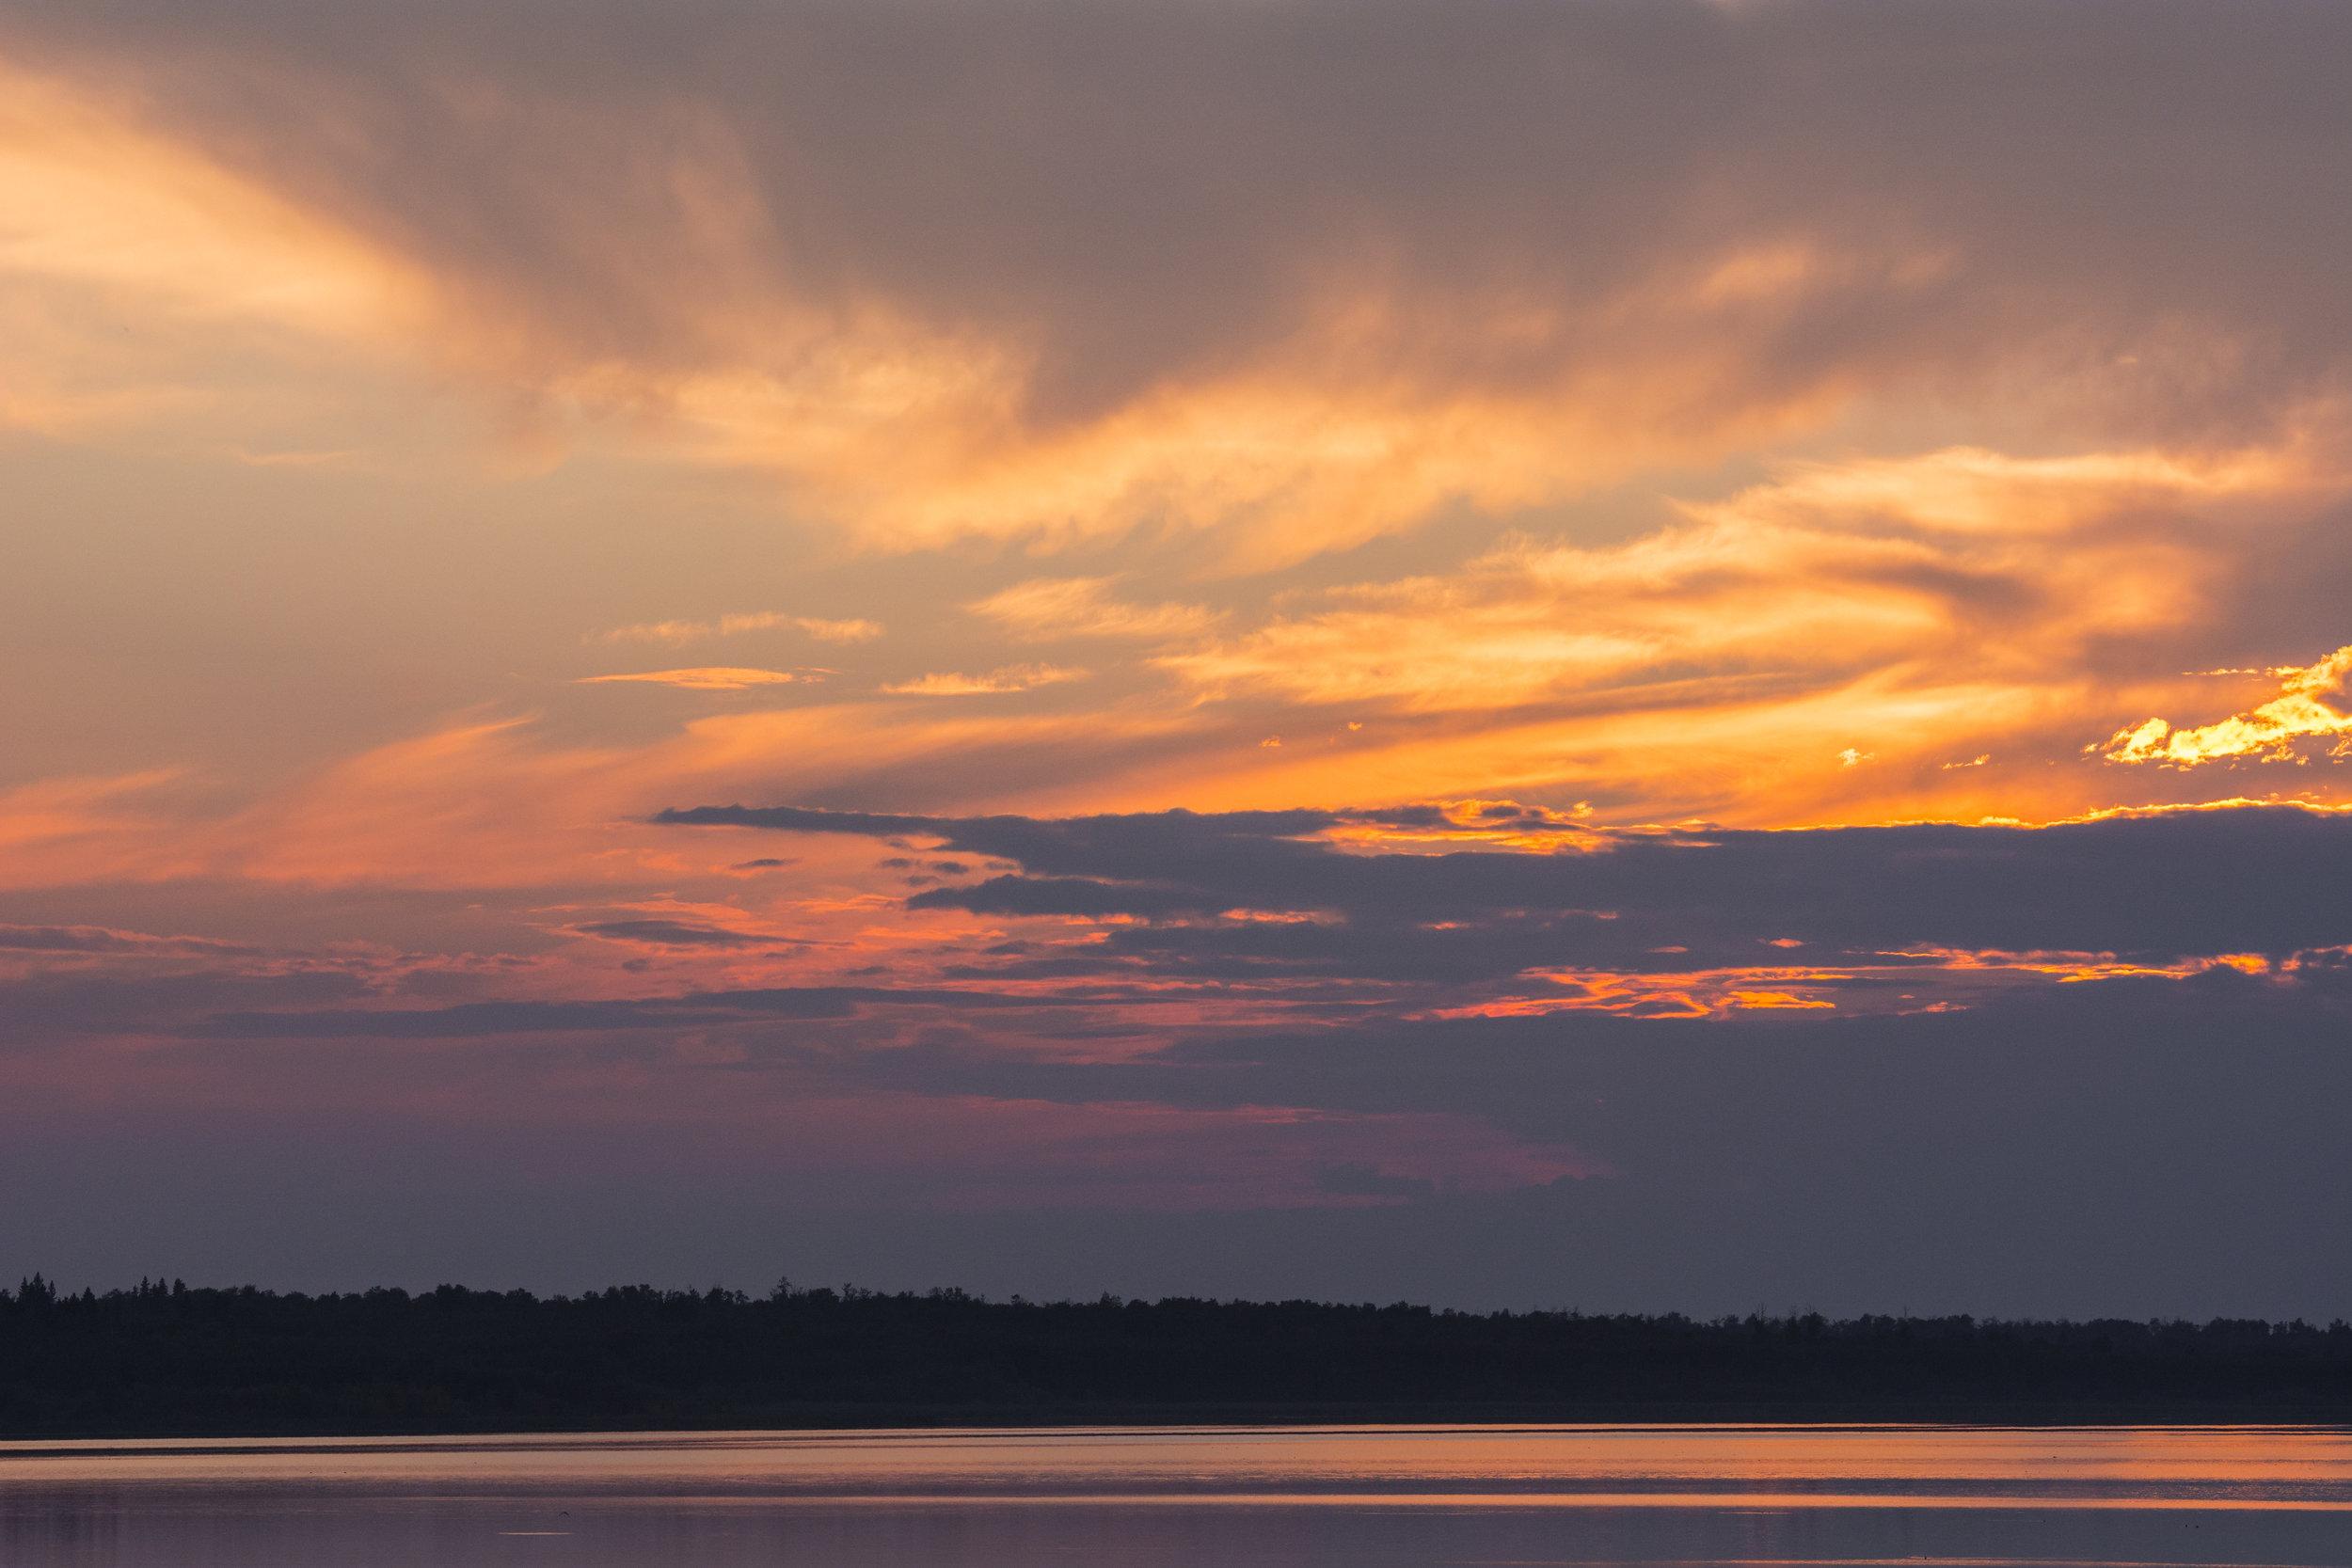 Sunset at Astotin Lake, Elk Island, National Park, Alberta, Canada